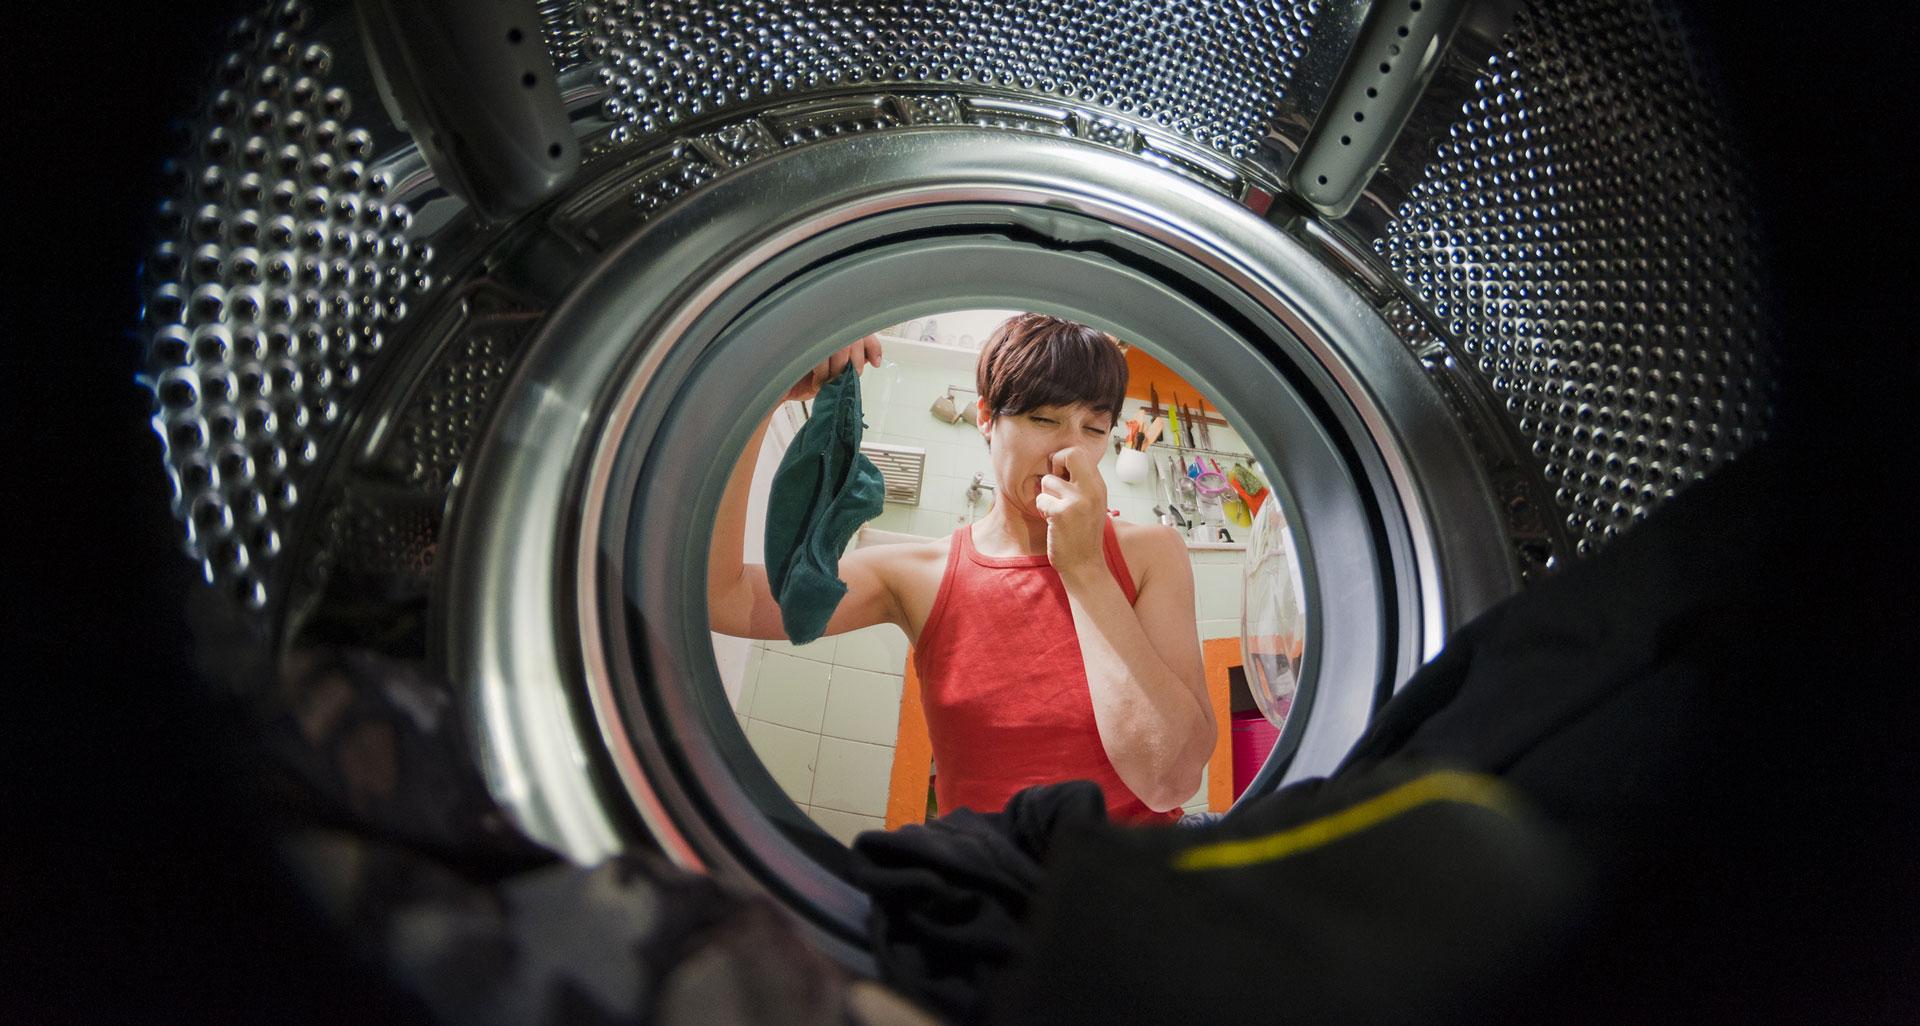 smelly dryer